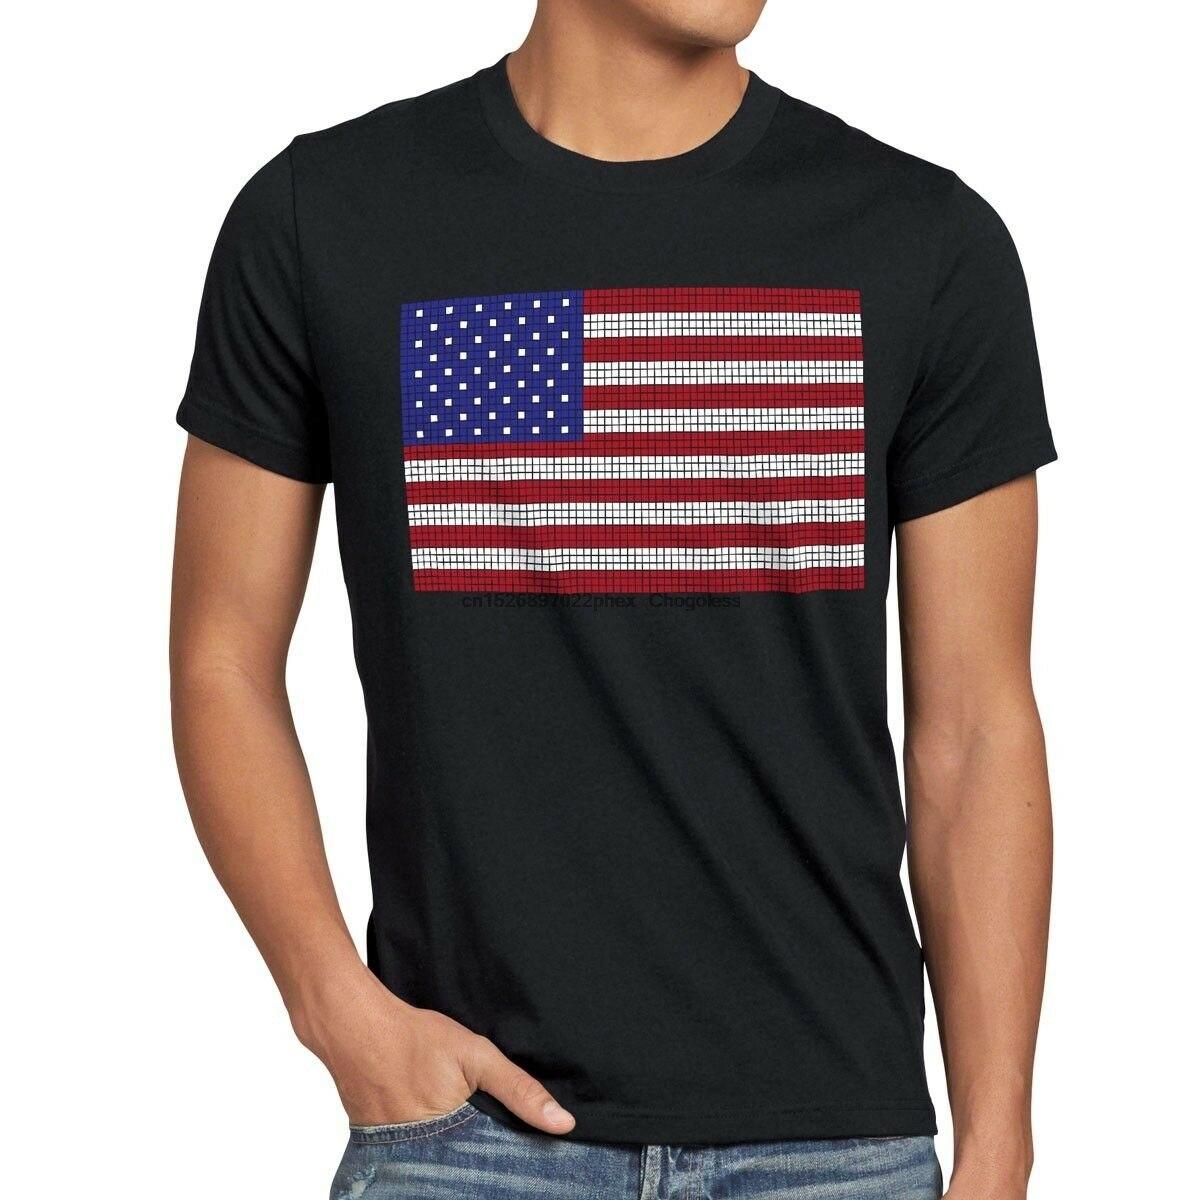 Eua bandeira 8-bit pixel camiseta masculino eua estrelas listras estados unidos csi